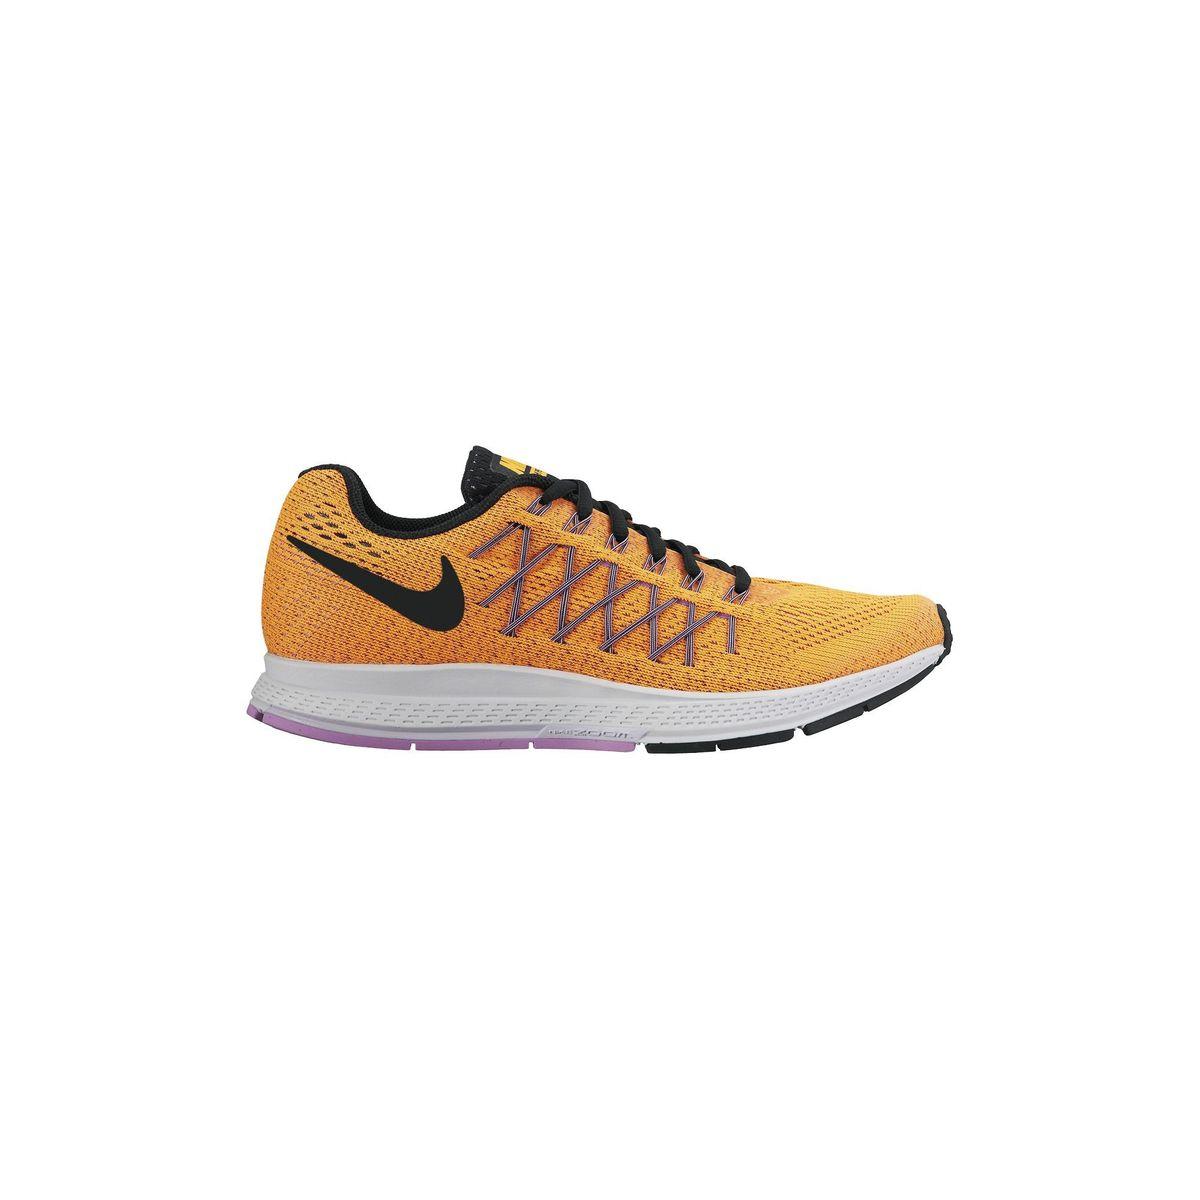 Womens Nike Women's Air Zoom Pegasus 32 Running Shoe On Sale Size 40